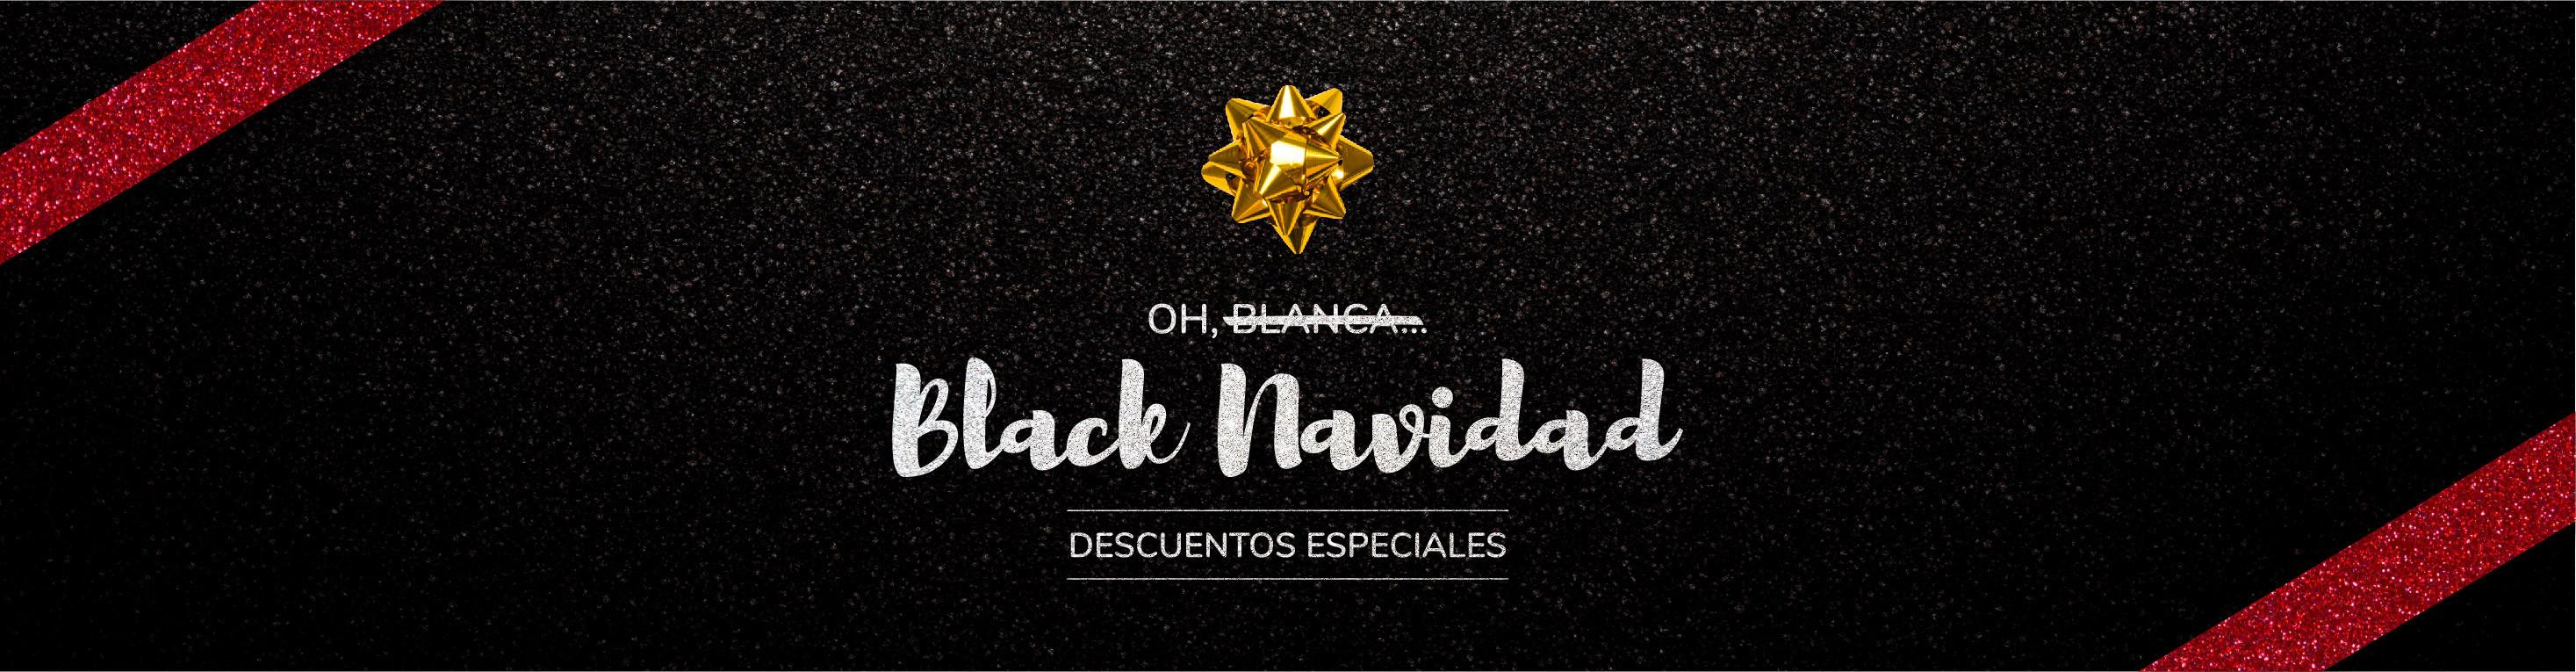 Black Navidad